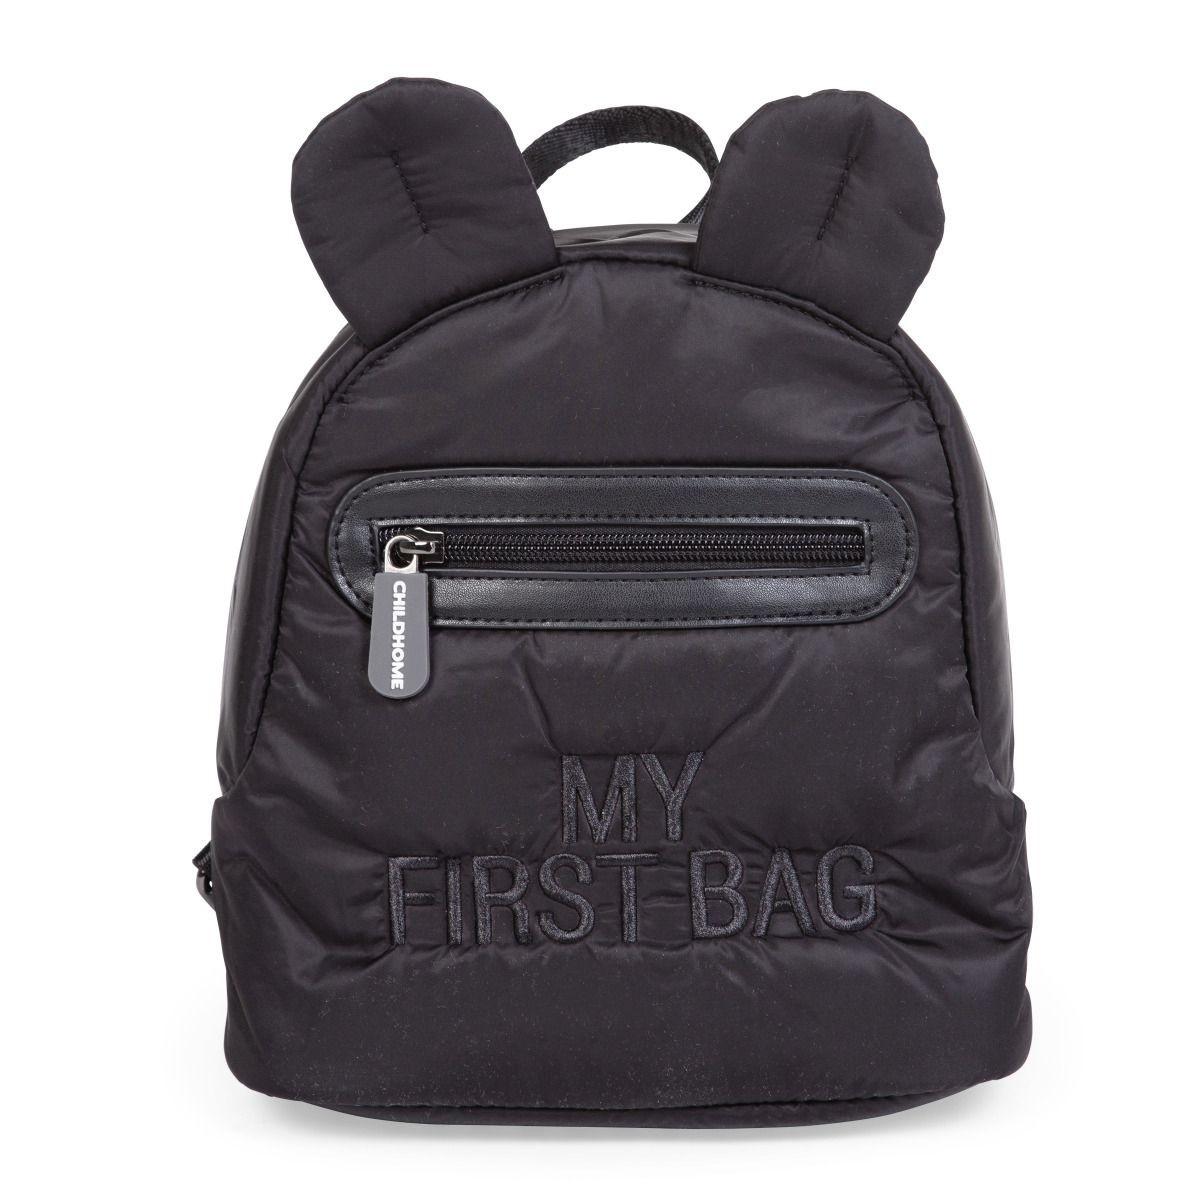 Sac à Dos First Bag Matelassé